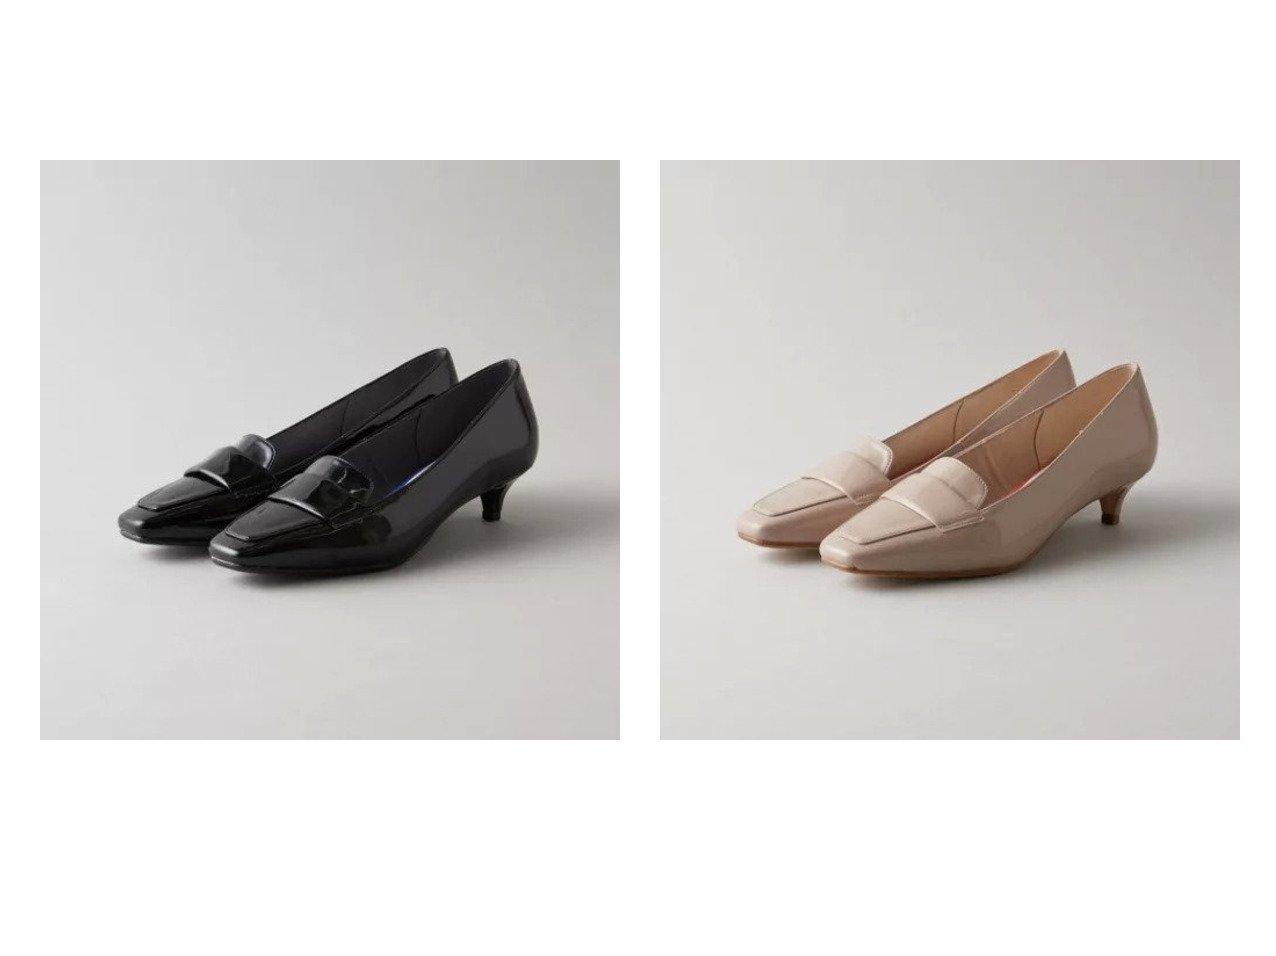 【Odette e Odile/オデット エ オディール】の【WEB限定】O ローファー パンプス35●↑ シューズ・靴のおすすめ!人気、トレンド・レディースファッションの通販 おすすめで人気の流行・トレンド、ファッションの通販商品 メンズファッション・キッズファッション・インテリア・家具・レディースファッション・服の通販 founy(ファニー) https://founy.com/ ファッション Fashion レディースファッション WOMEN コンビ シューズ  ID:crp329100000024760